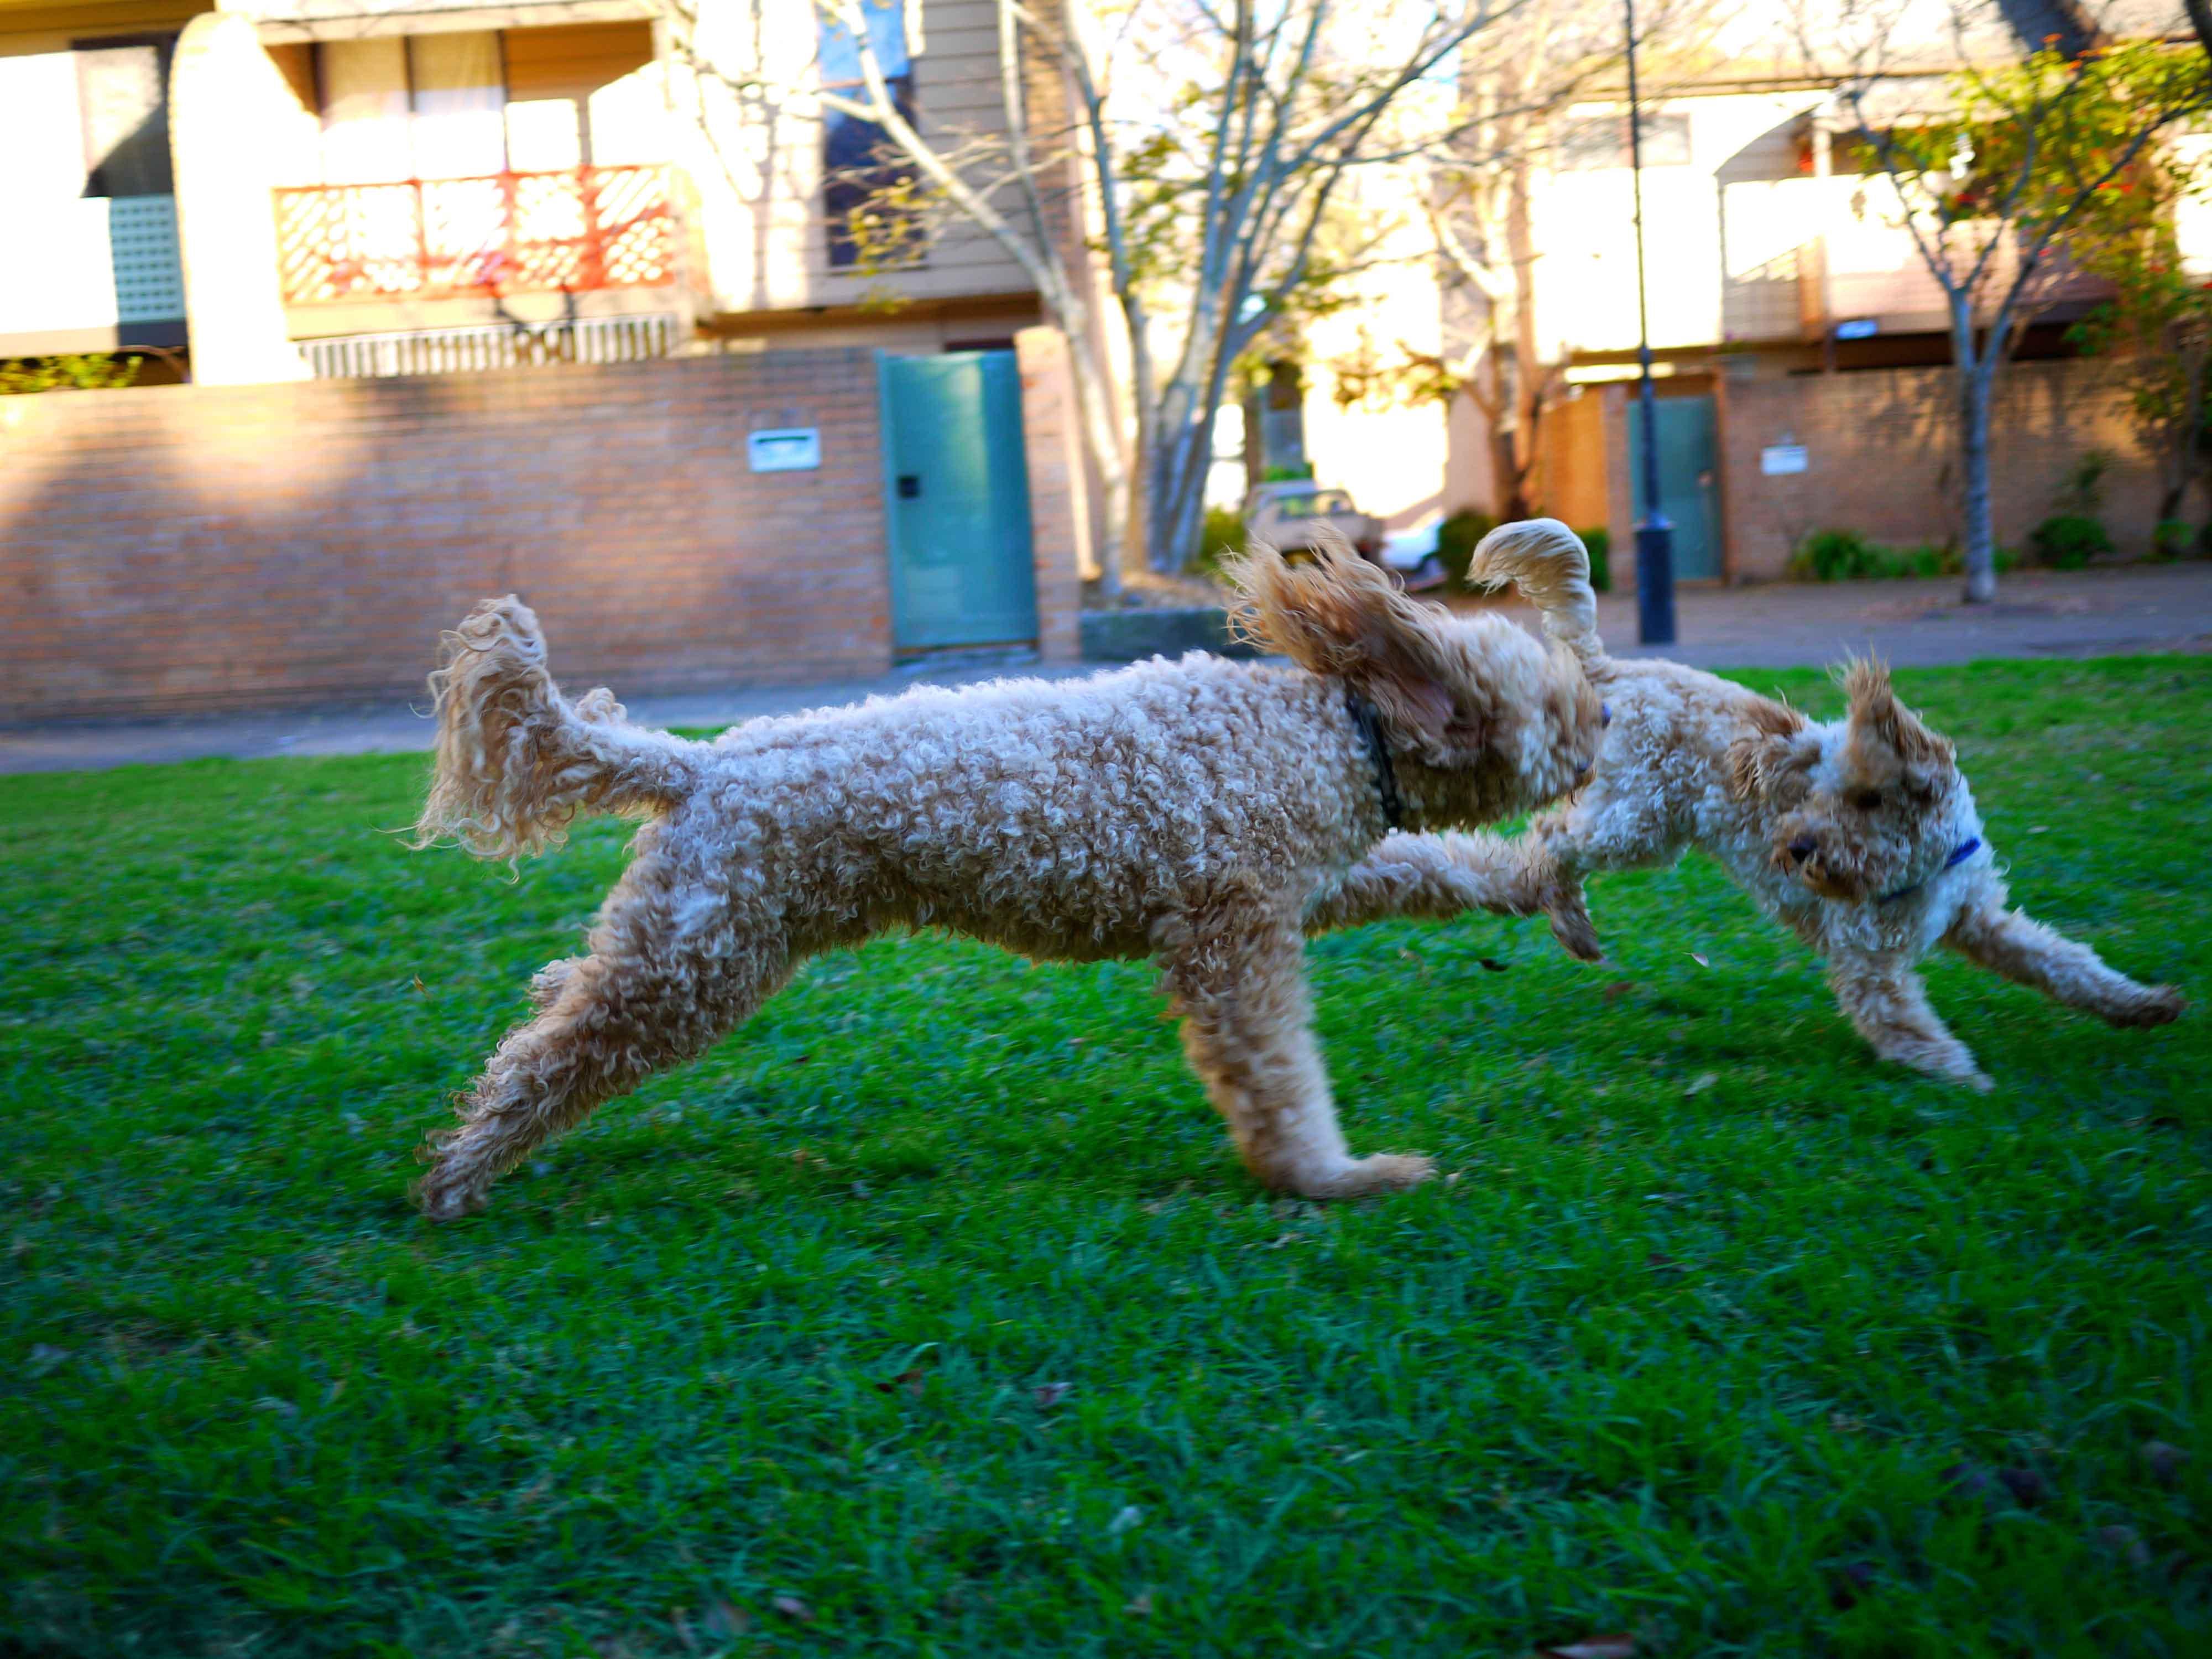 Forbes street - dog  playing area in  Woolloomooloo